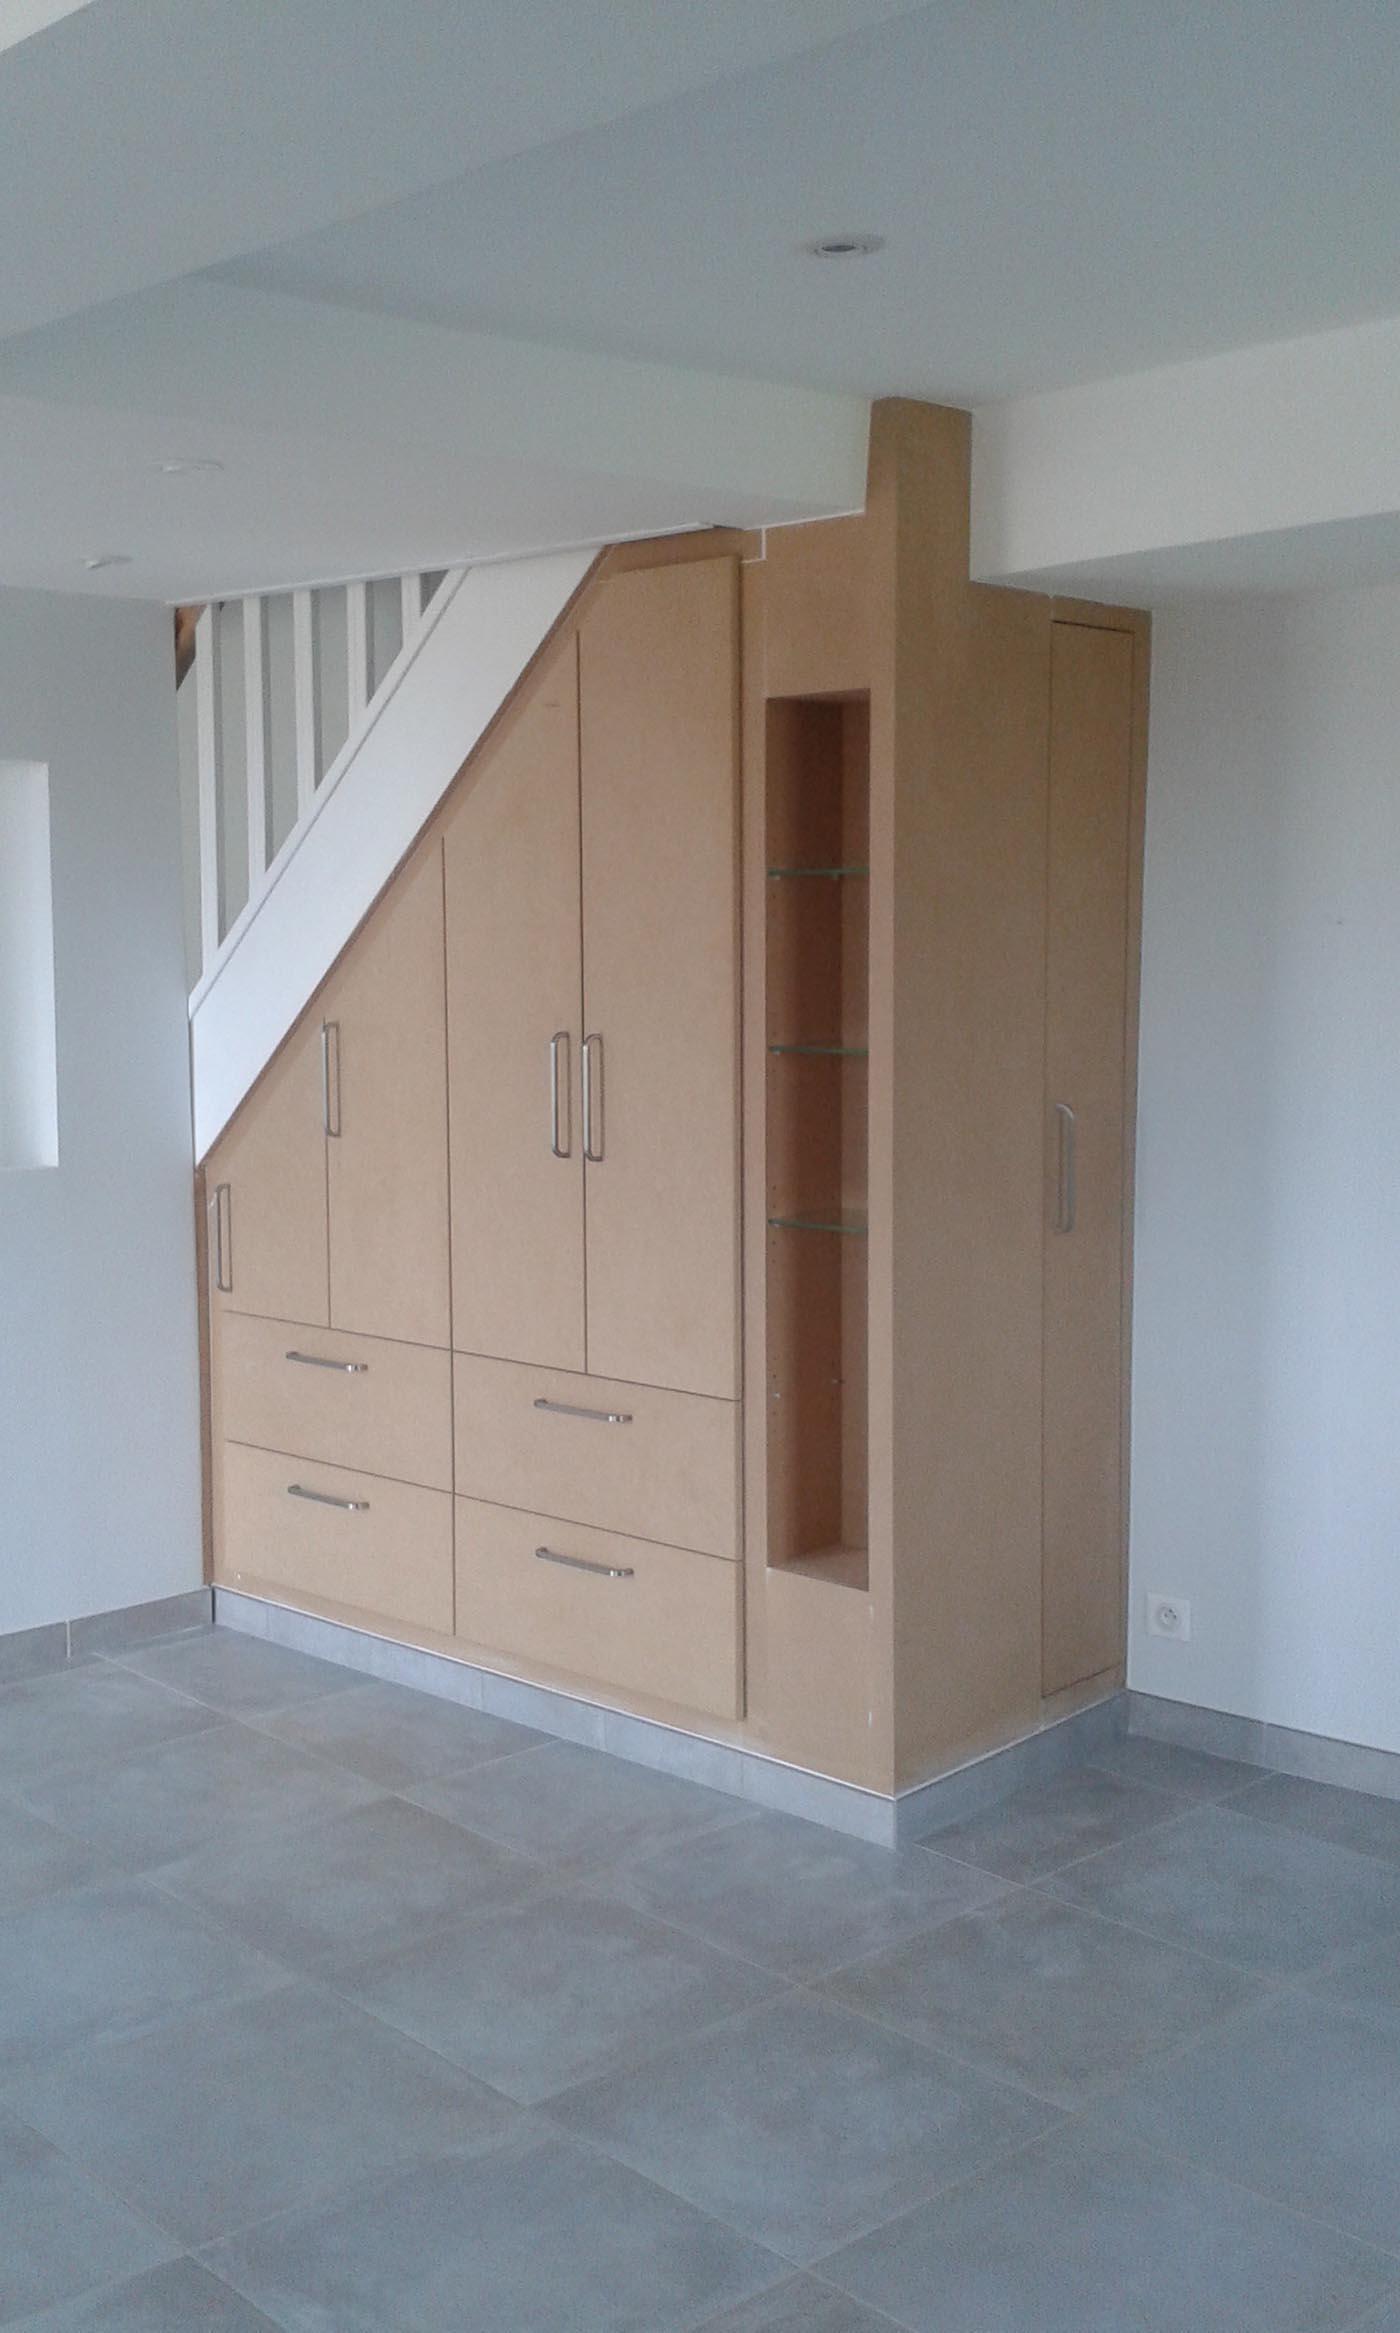 tele sous escalier meuble tv escalier meuble tv blanc sous escalier sur mesure meuble tv sous. Black Bedroom Furniture Sets. Home Design Ideas